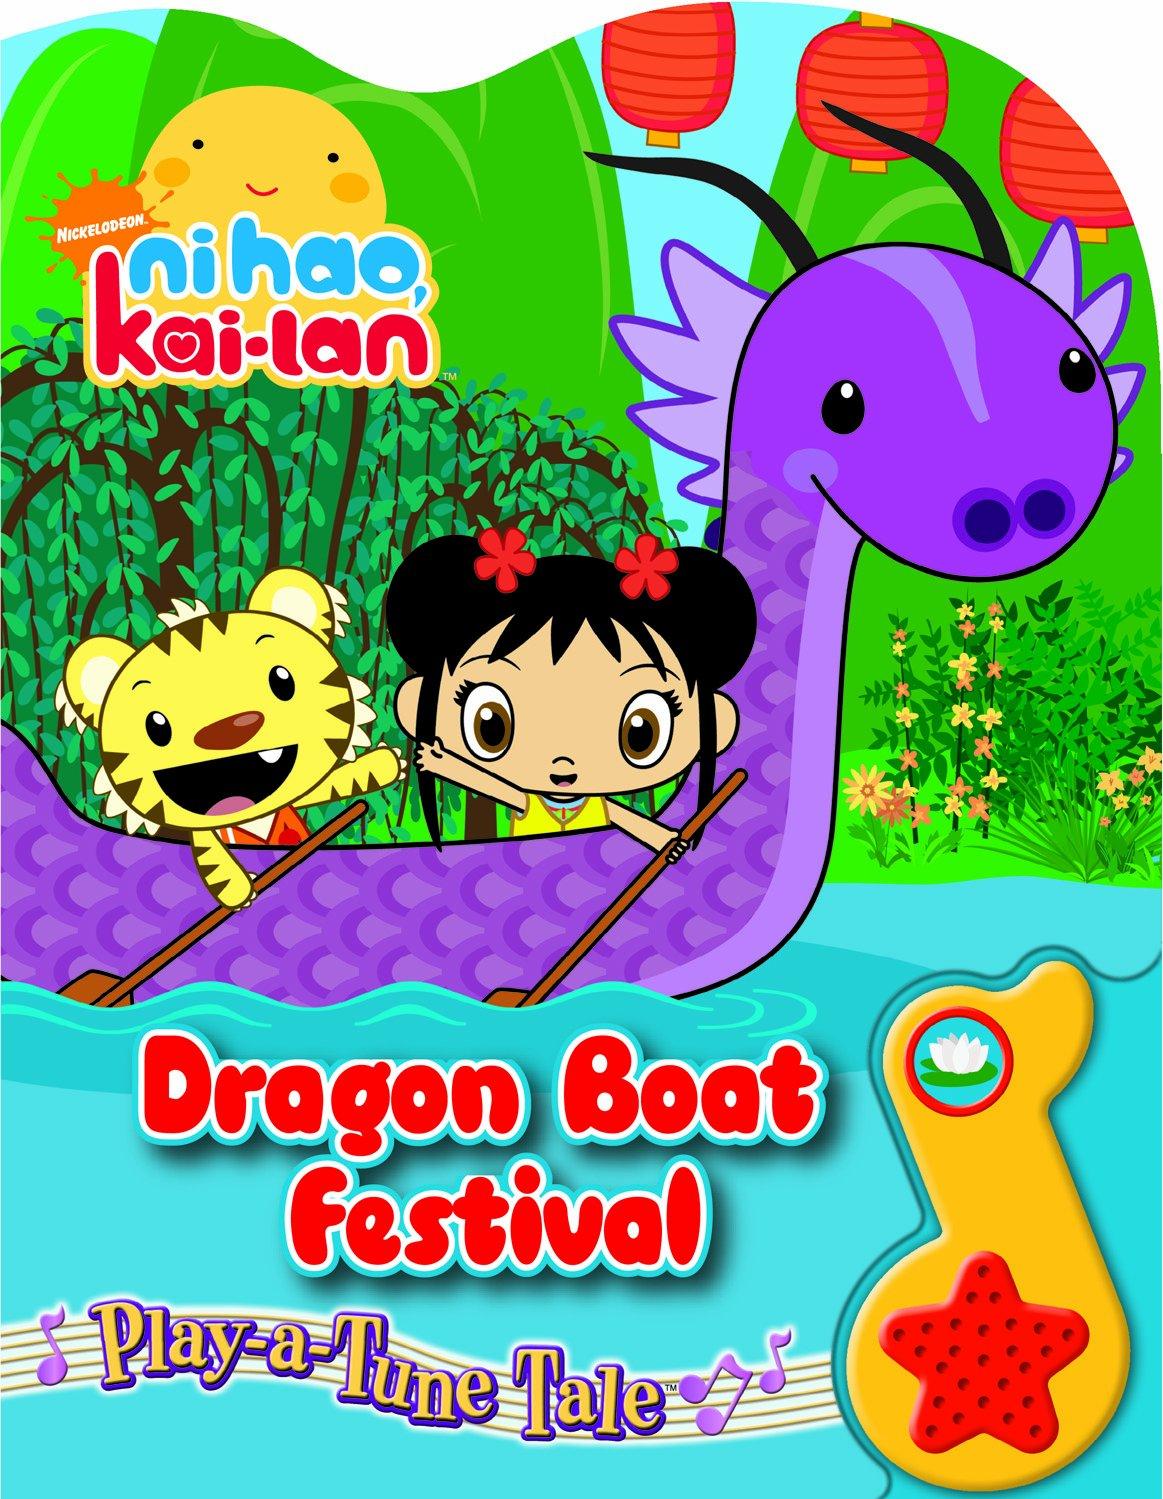 play a tune tale ni hao kai lan dragon boat festival editors of